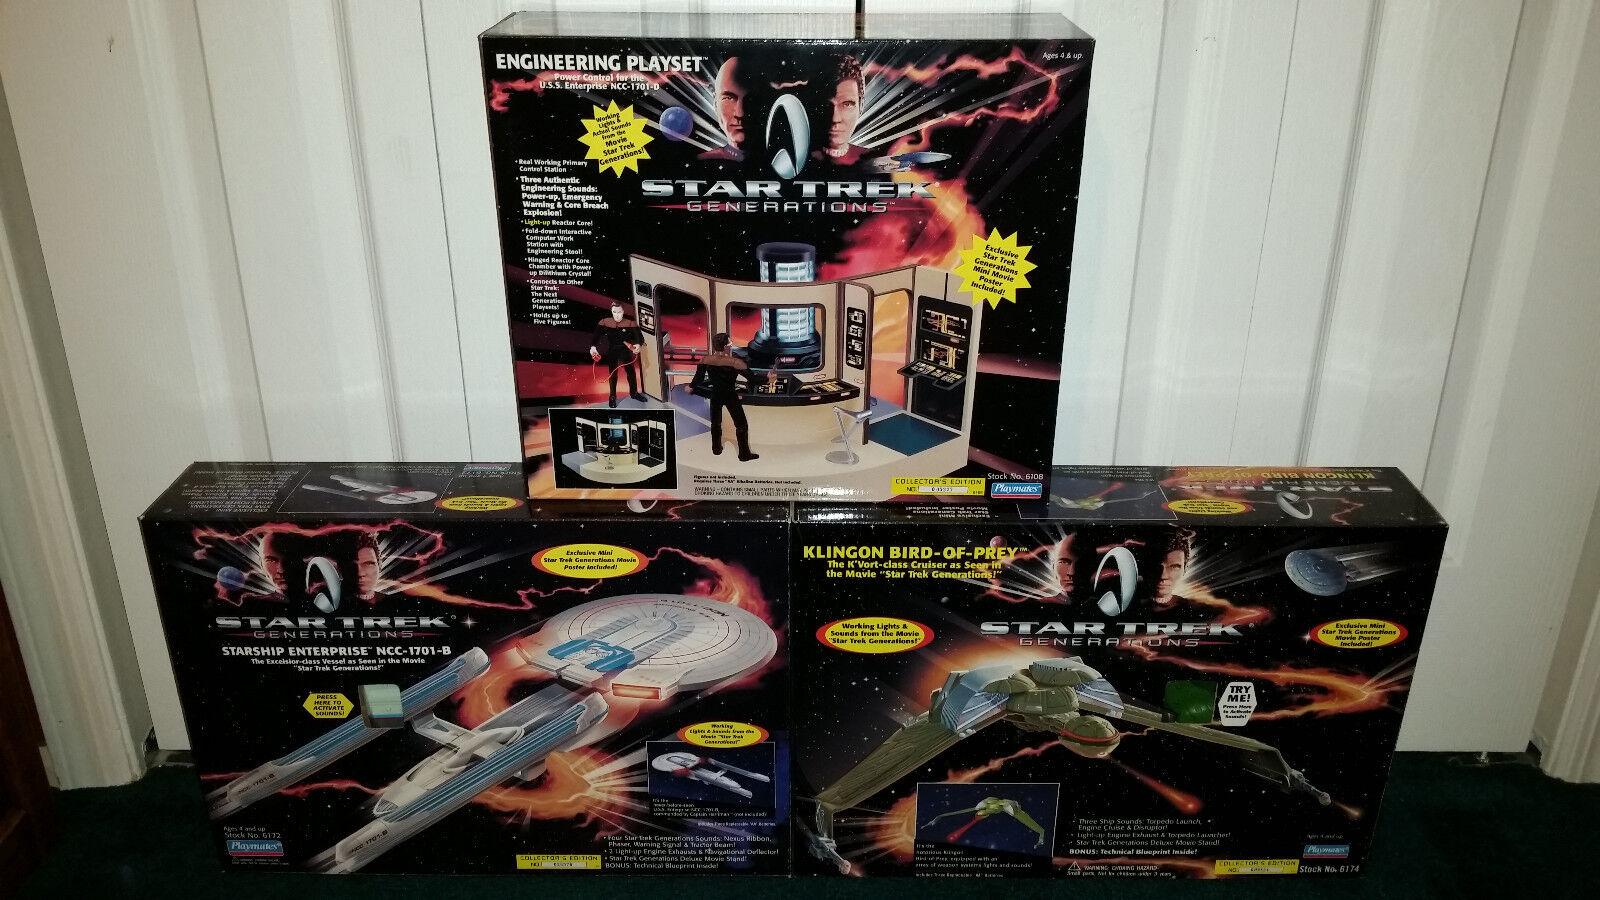 Starship Enterprise + Klingon Bird-Of-Prey + Engineering Star Trek Generations